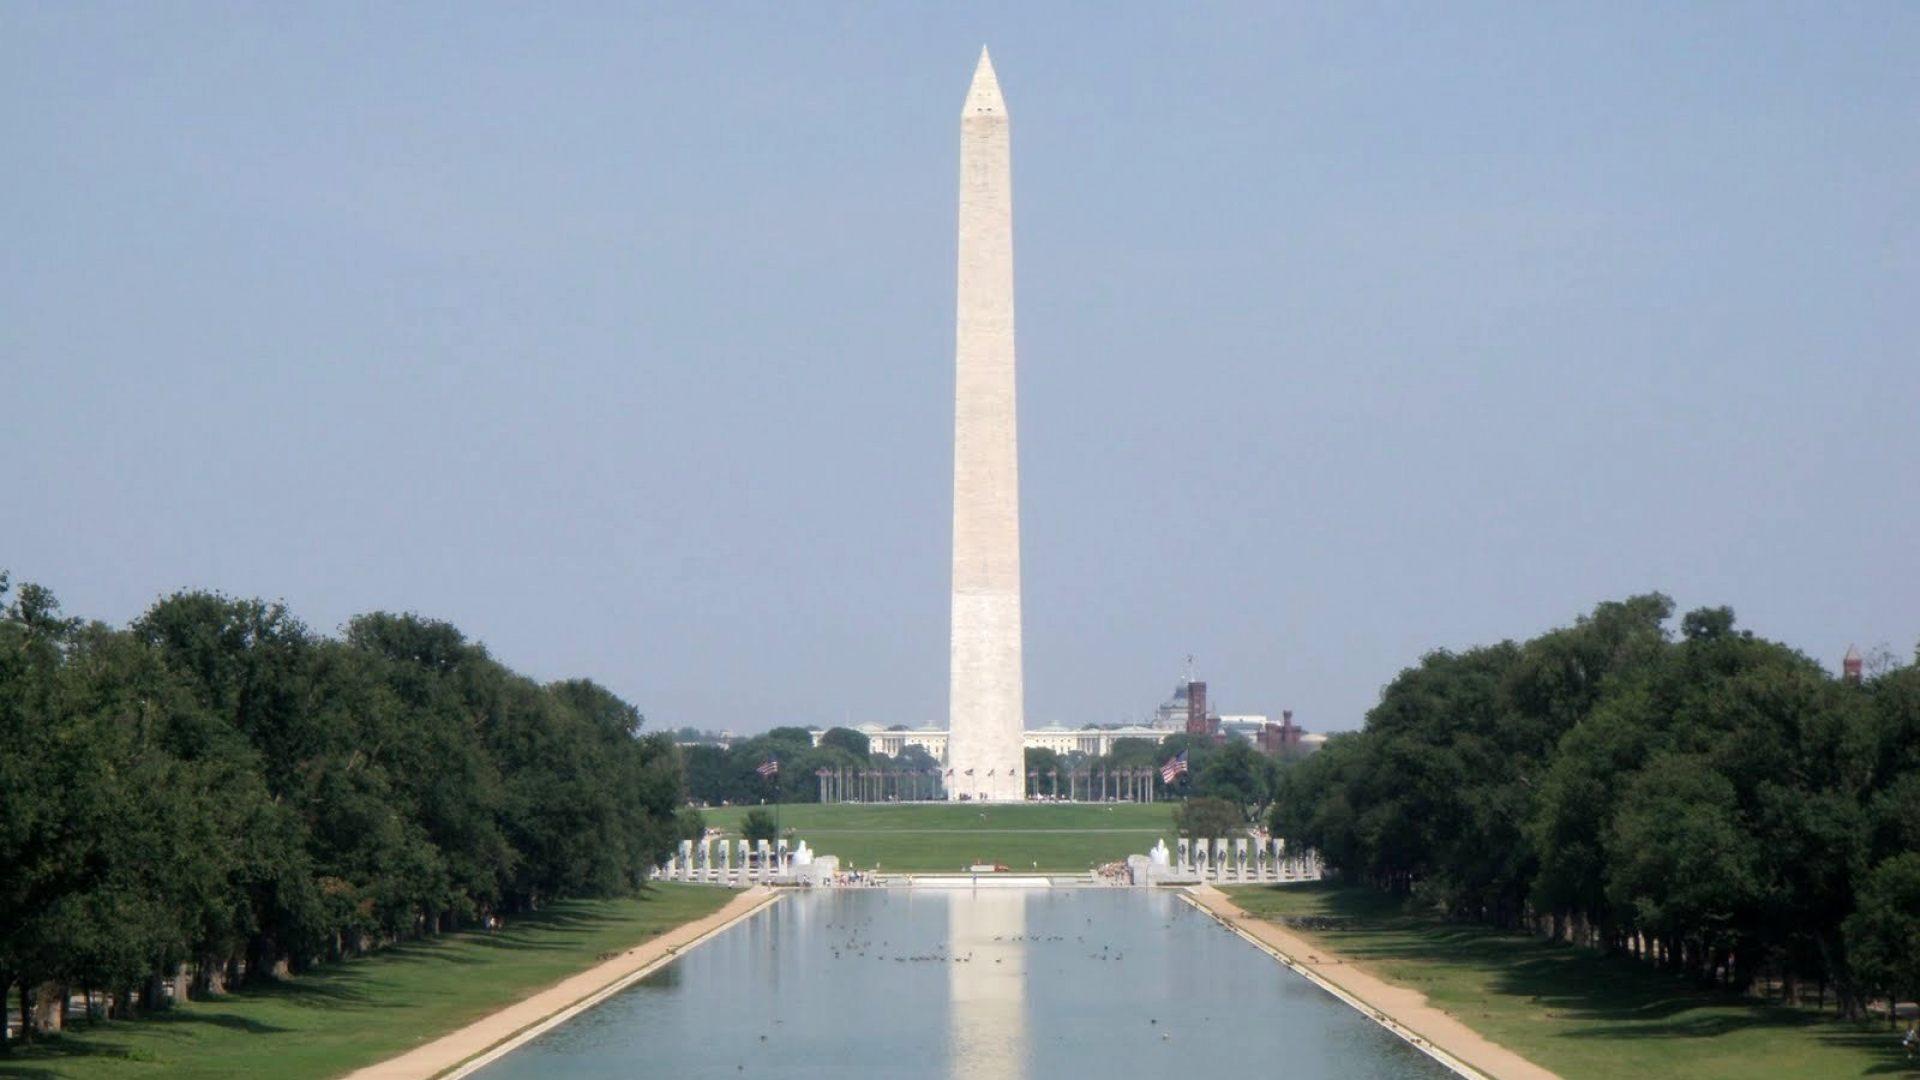 Monumento a Washington, Washington D.C.